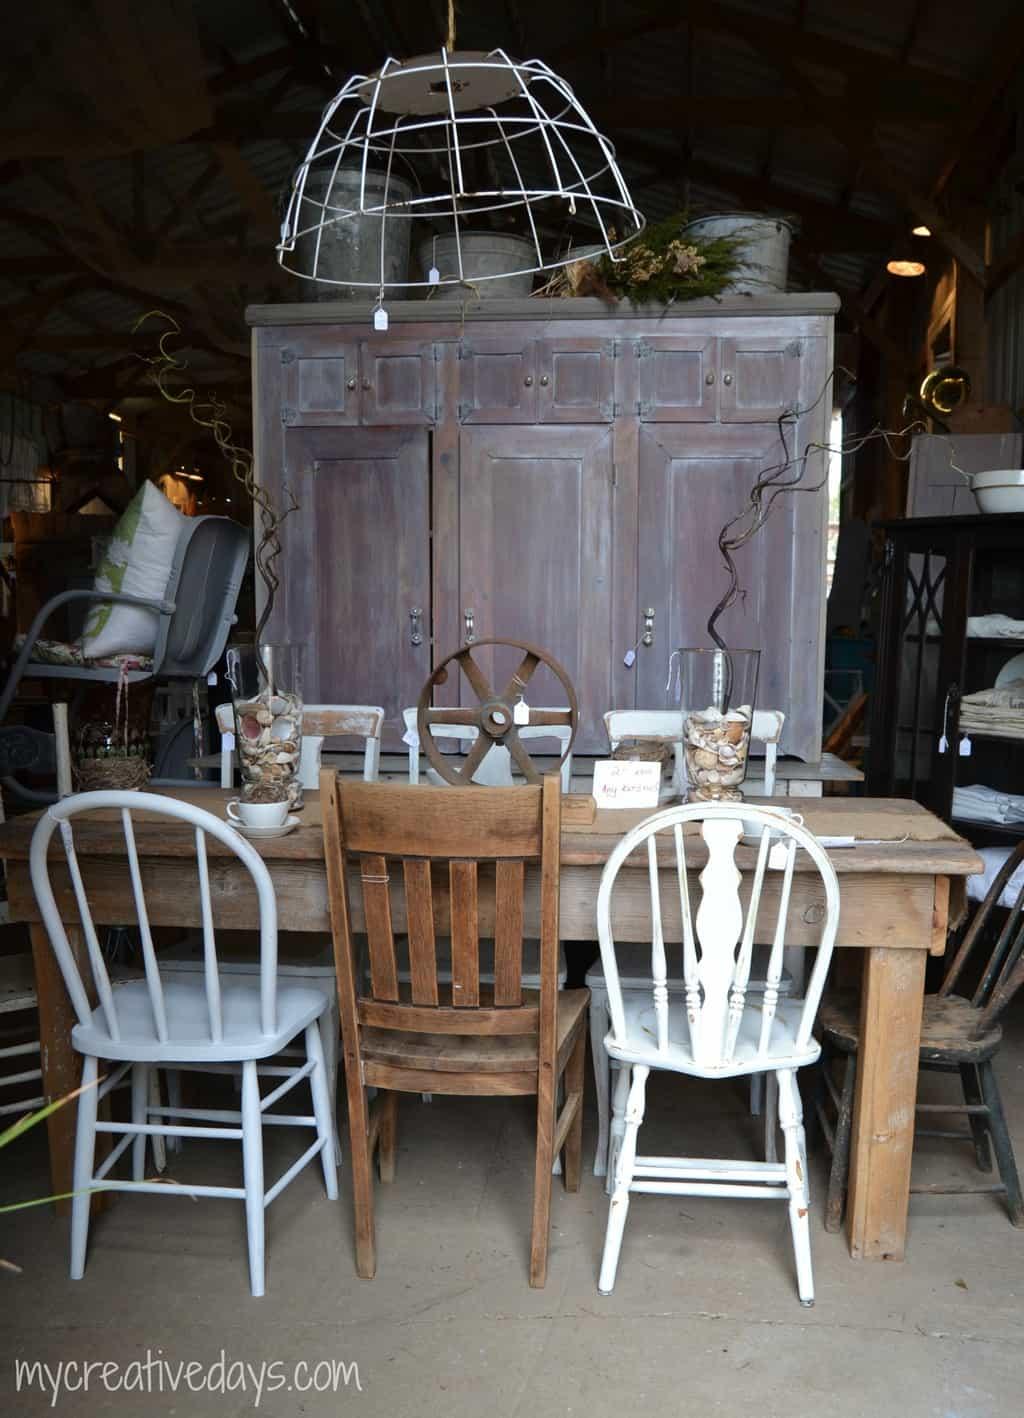 Elegant Barn Spring Sale - Lowden, Iowa mycreativedays.com